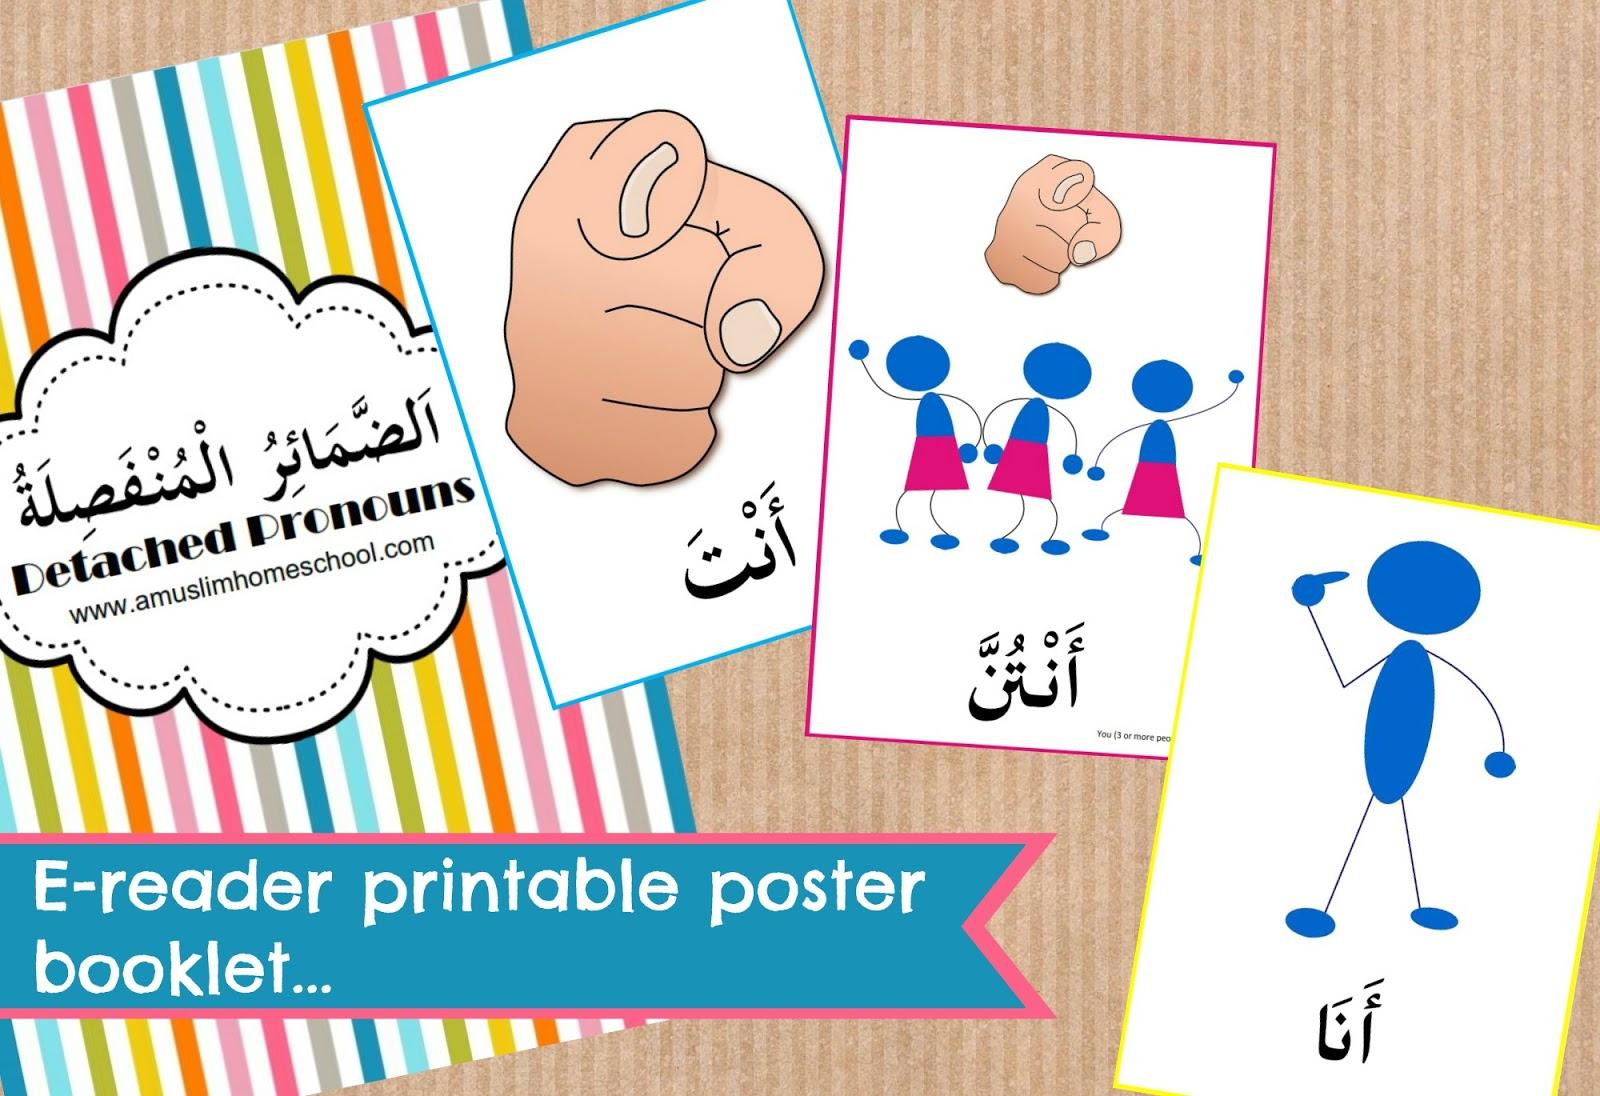 A Muslim Homeschool Arabic Detached Pronouns Poster Book